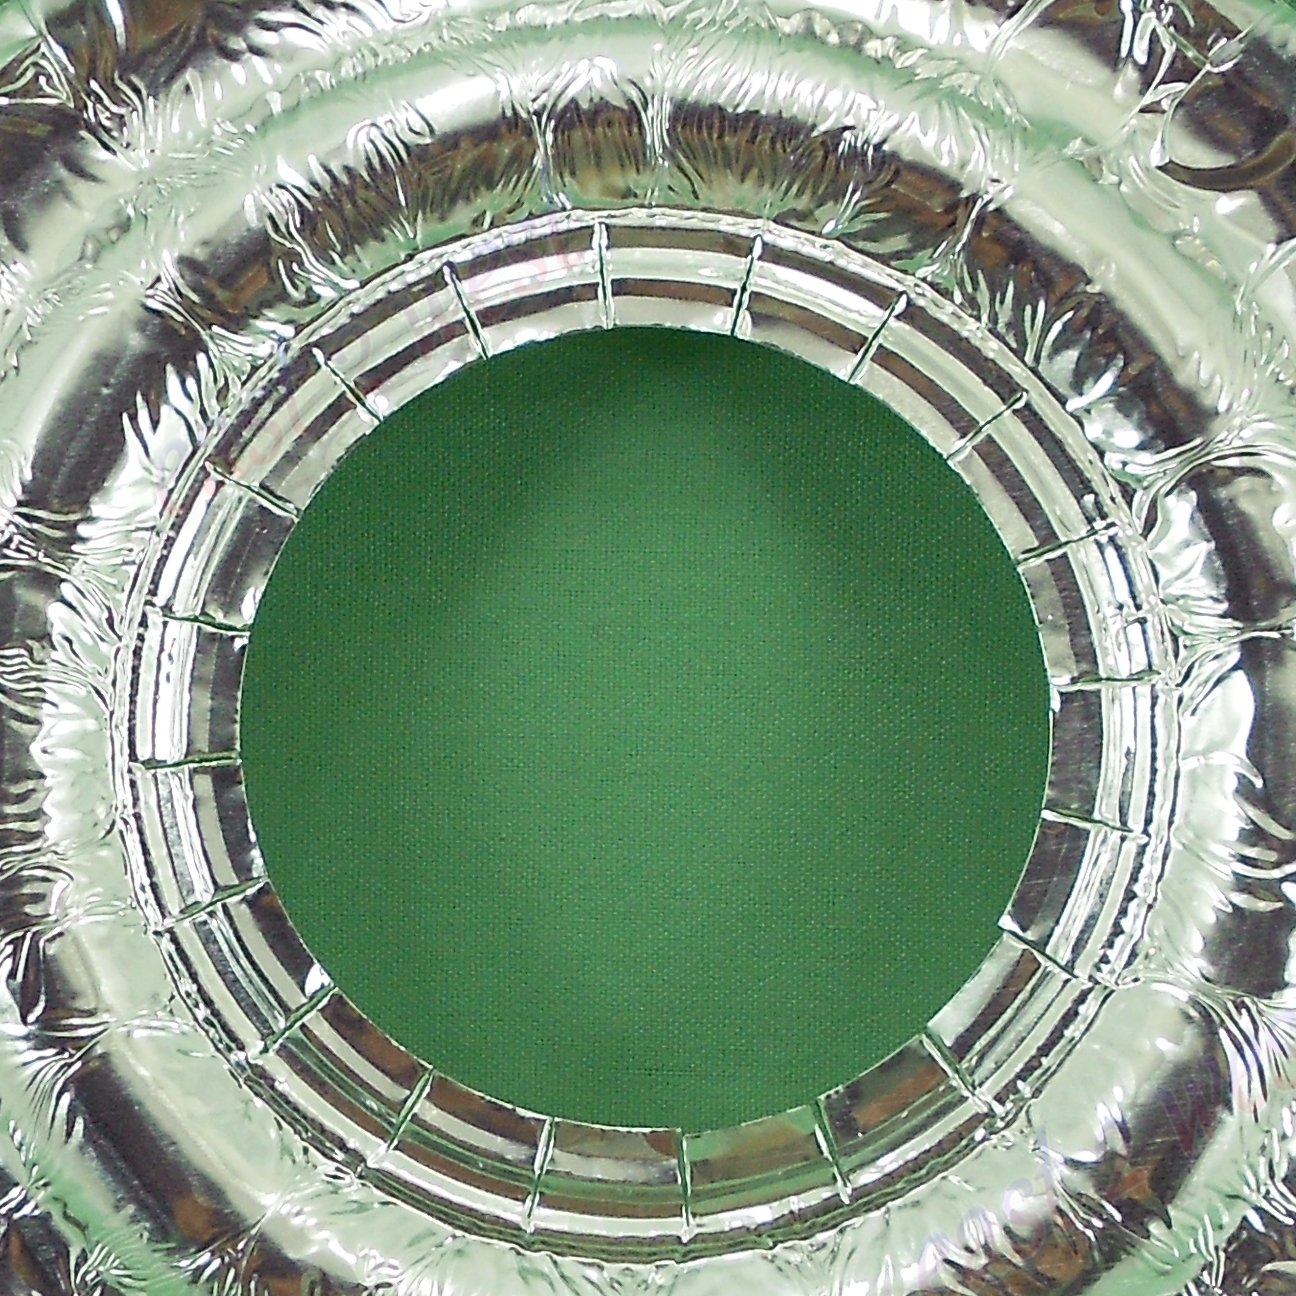 100 UNIVERSAL Round Aluminum Foil Gas Burner Bib Liners Covers Disposal Round 100